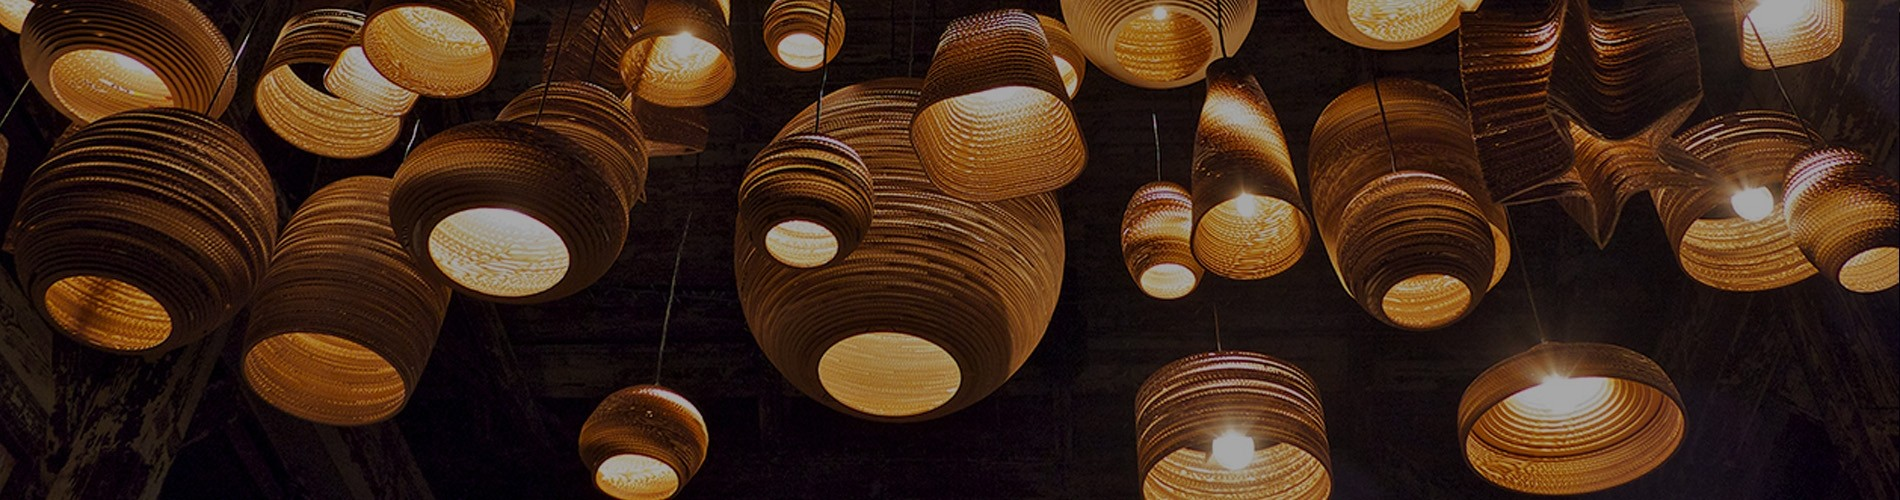 UK Ceiling Lights | Industrial Lamps Pendant Chandelier Lighting